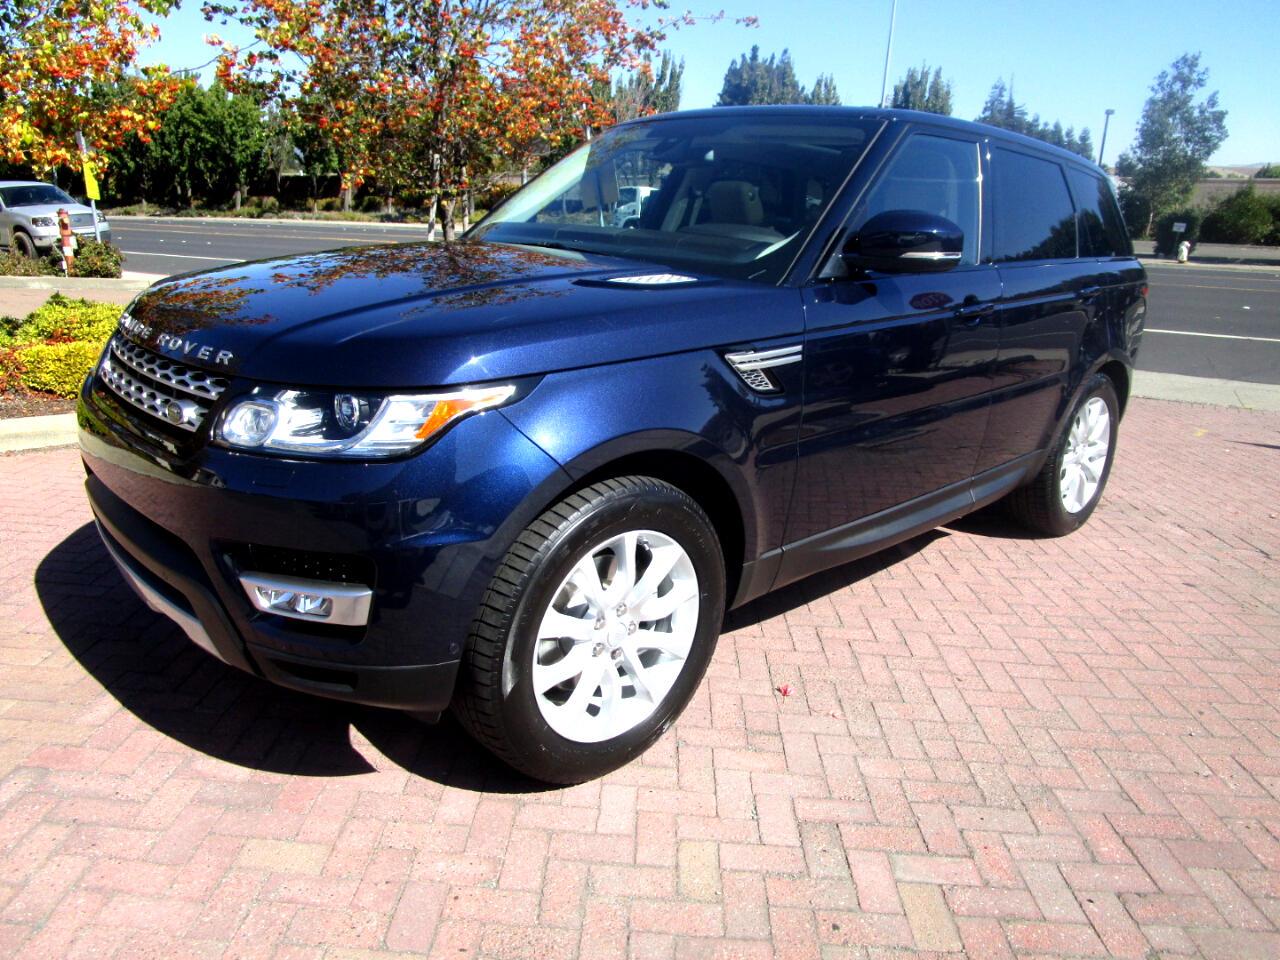 2015 Land Rover Range Rover Sport HSE**POWER 3RD ROW**HEAT/AC SEATS**REAR HEAT SEATS